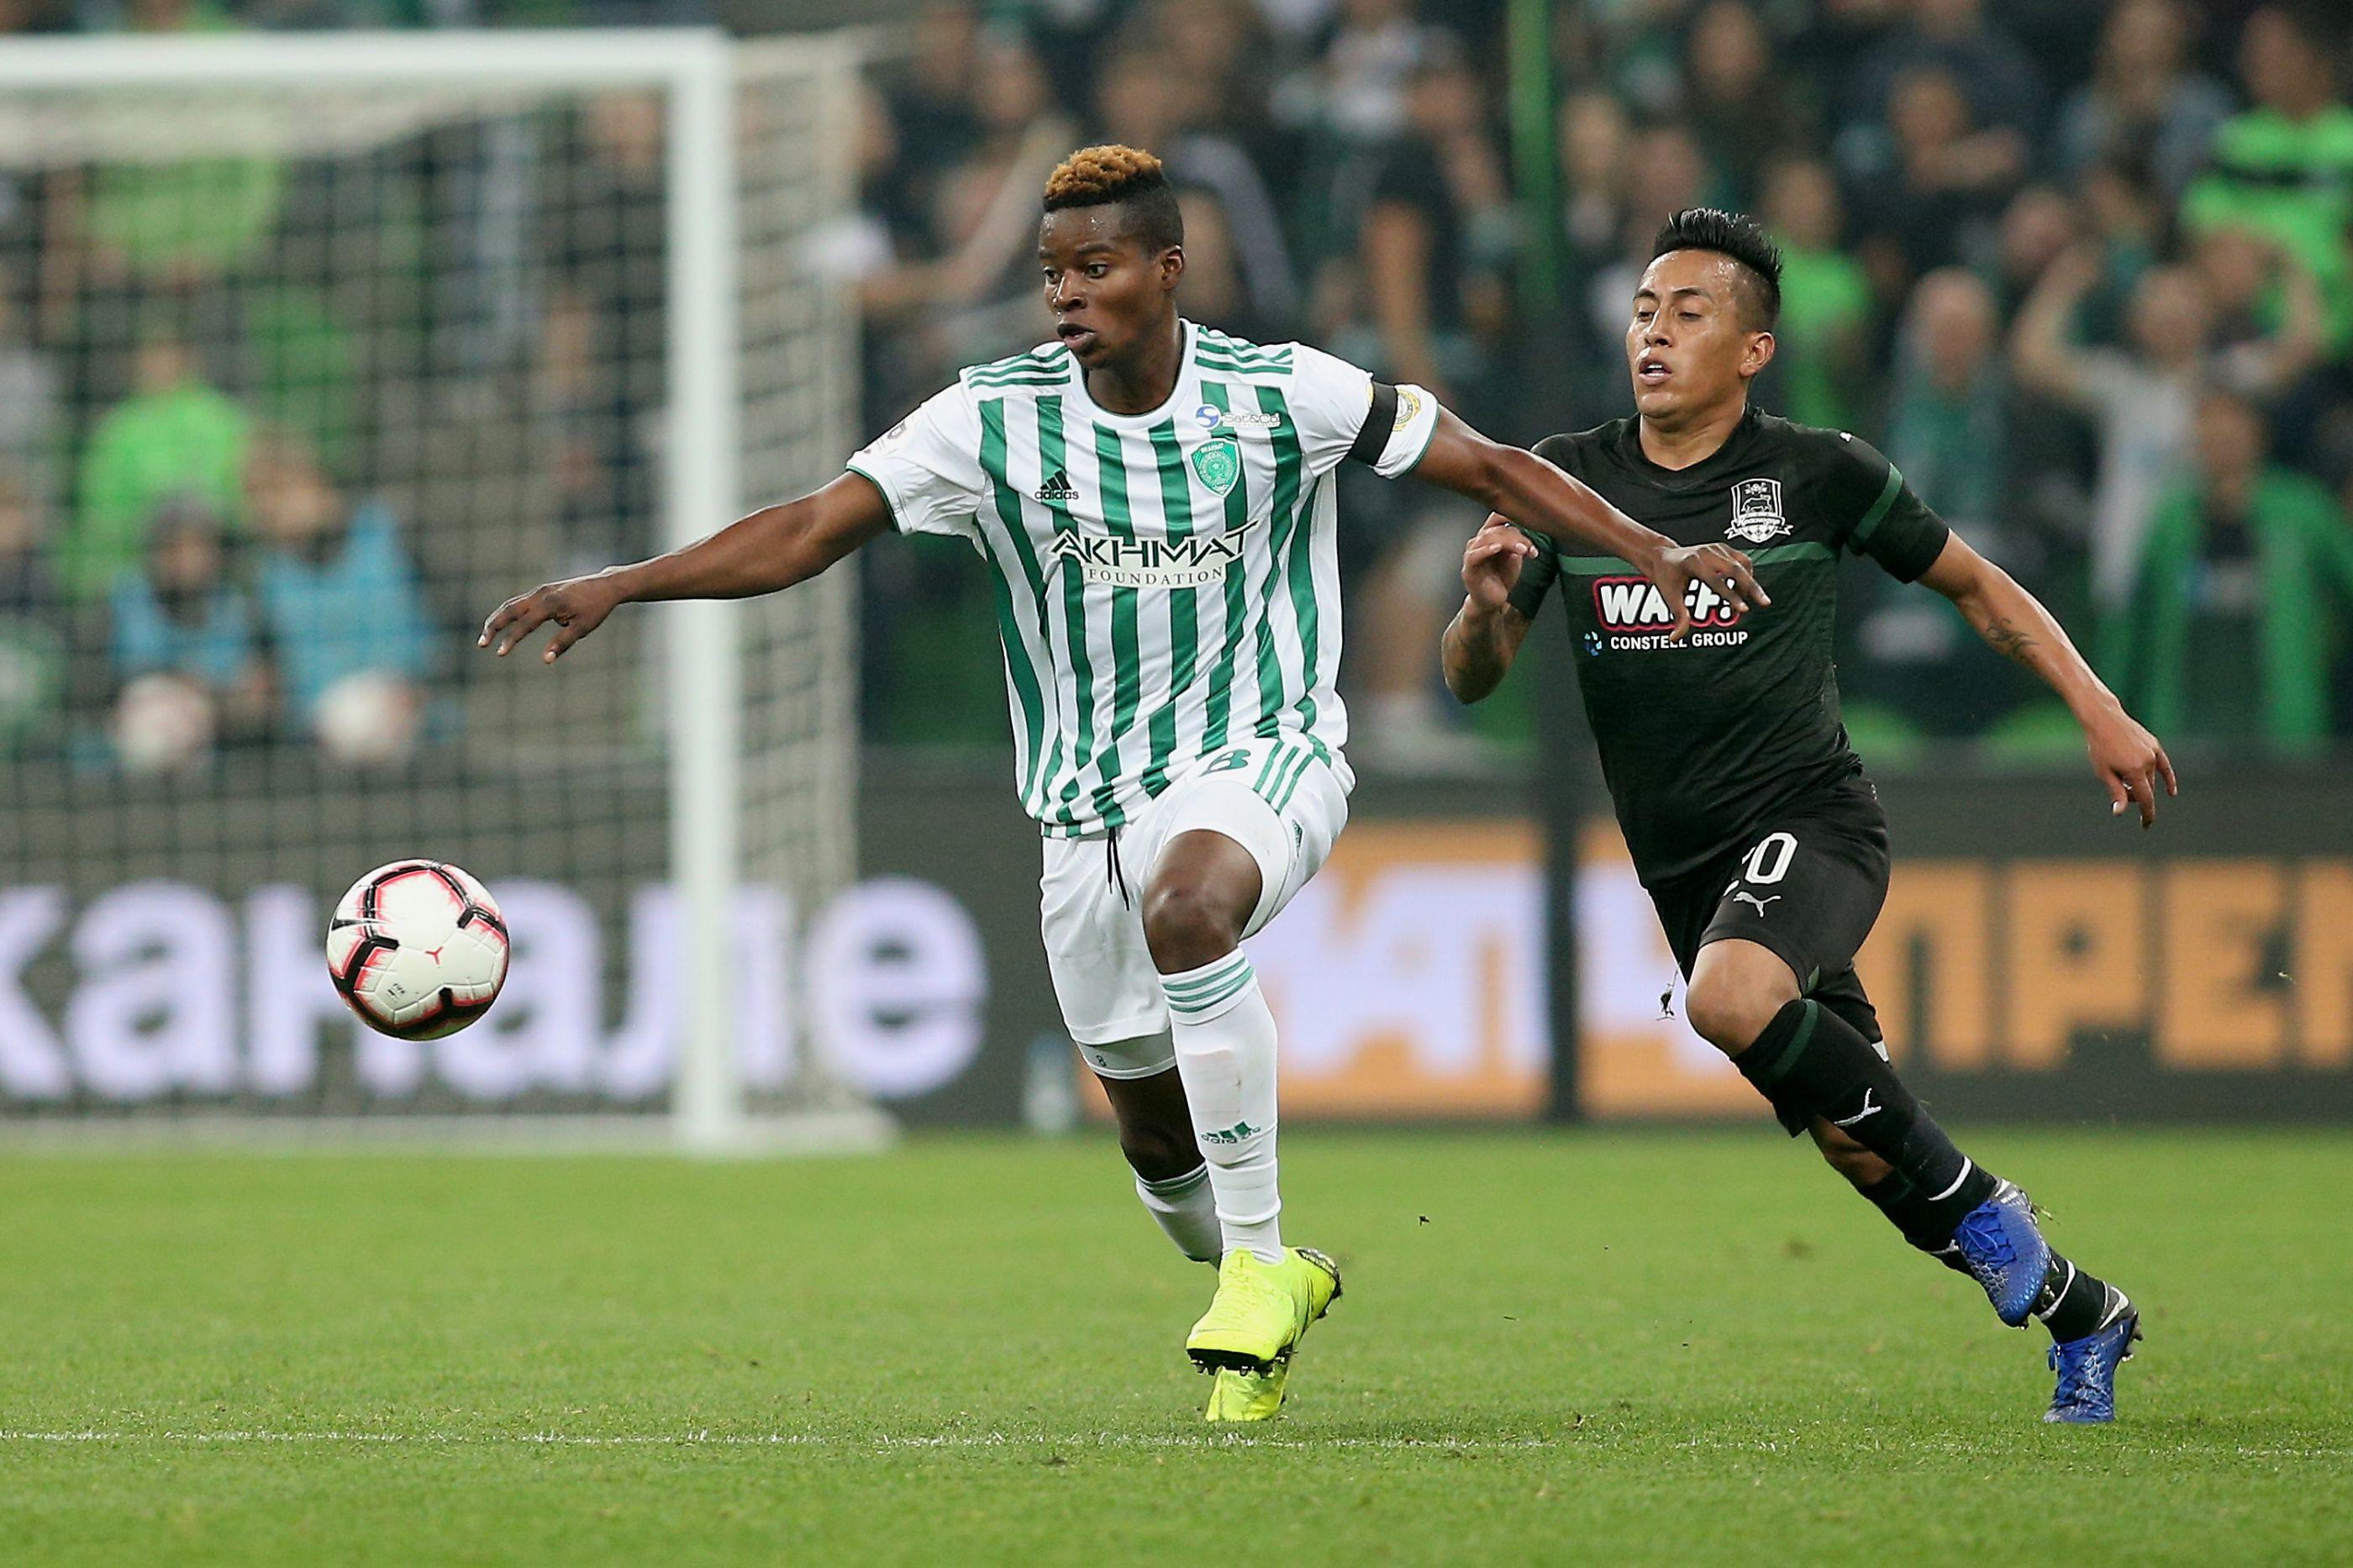 Oficial: Idrissa Doumbia assina pelo Sporting